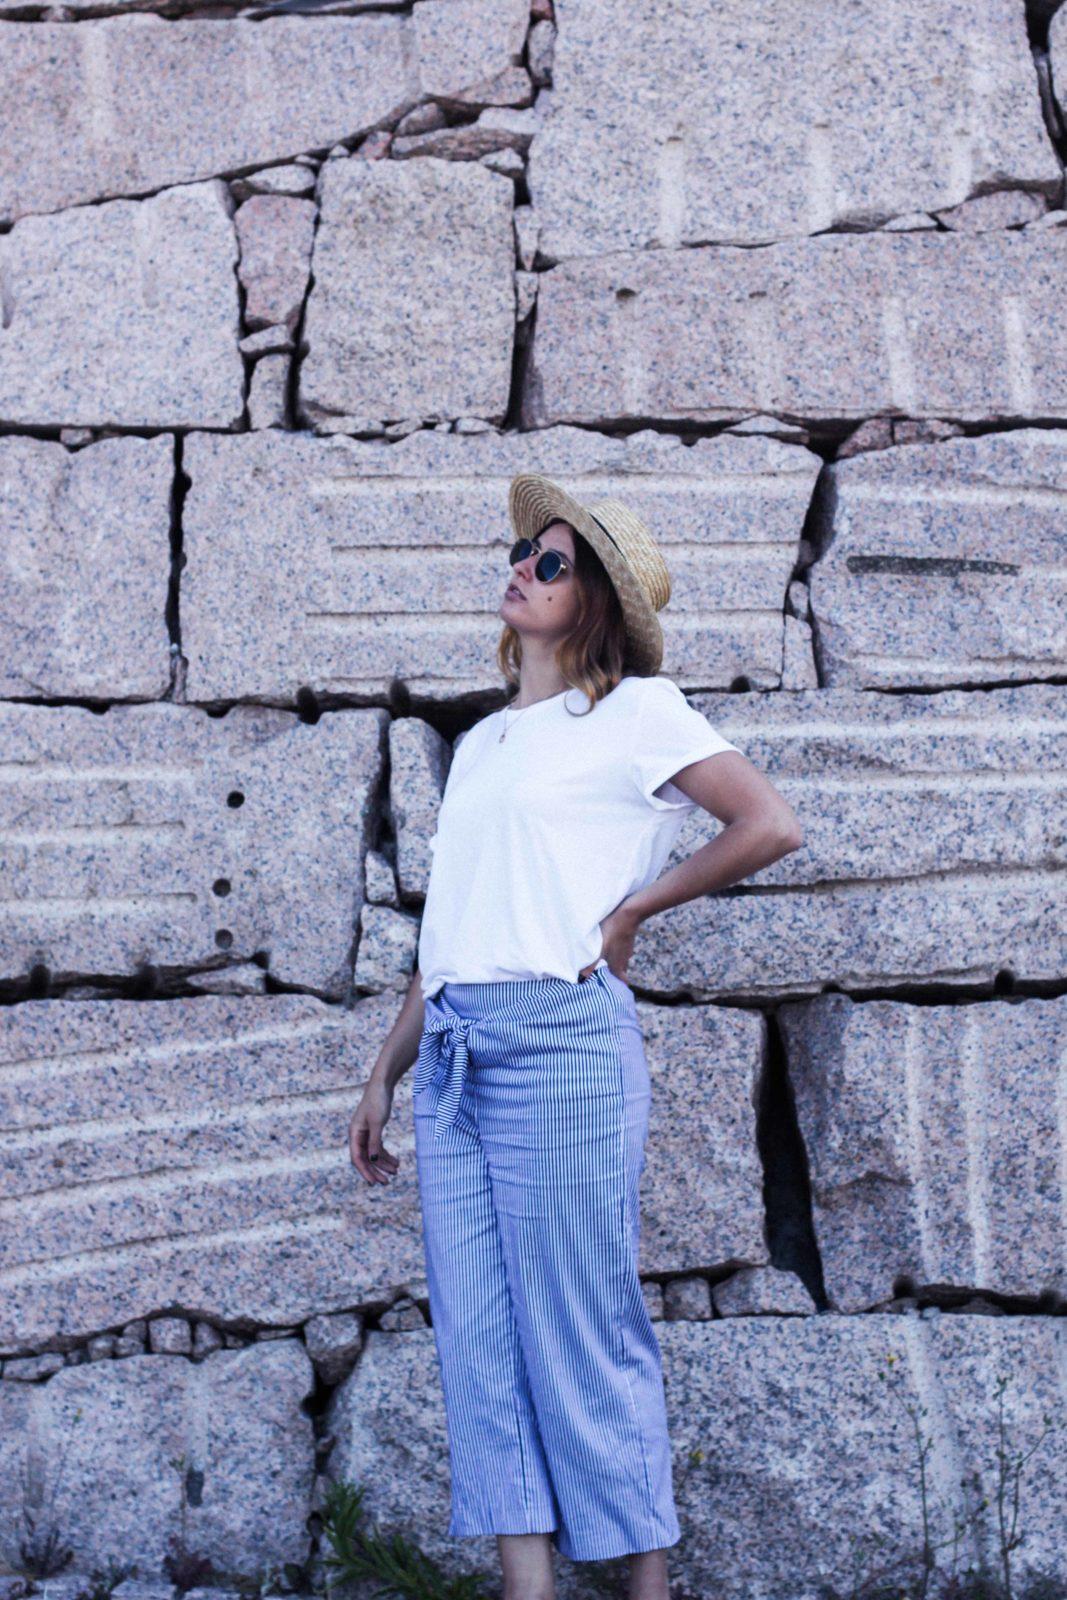 pantalones_con_lazo_colgante_herradura_donkeycool_ardentia_canotier-29